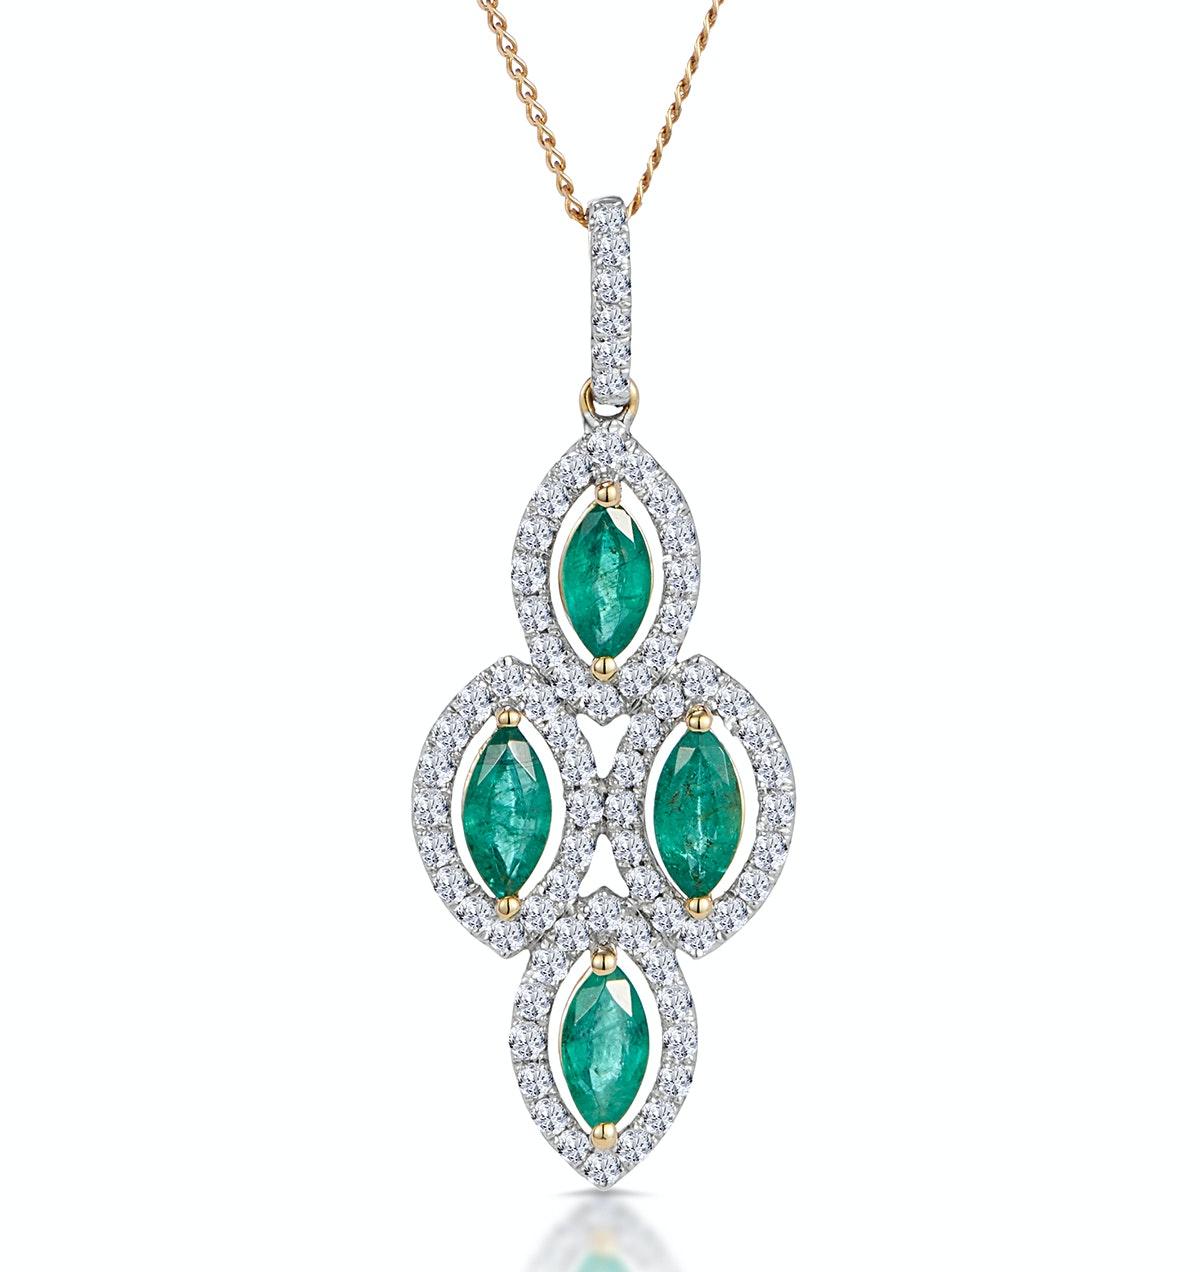 1ct Emerald Asteria Collection Diamond Drop Pendant in 18K Gold